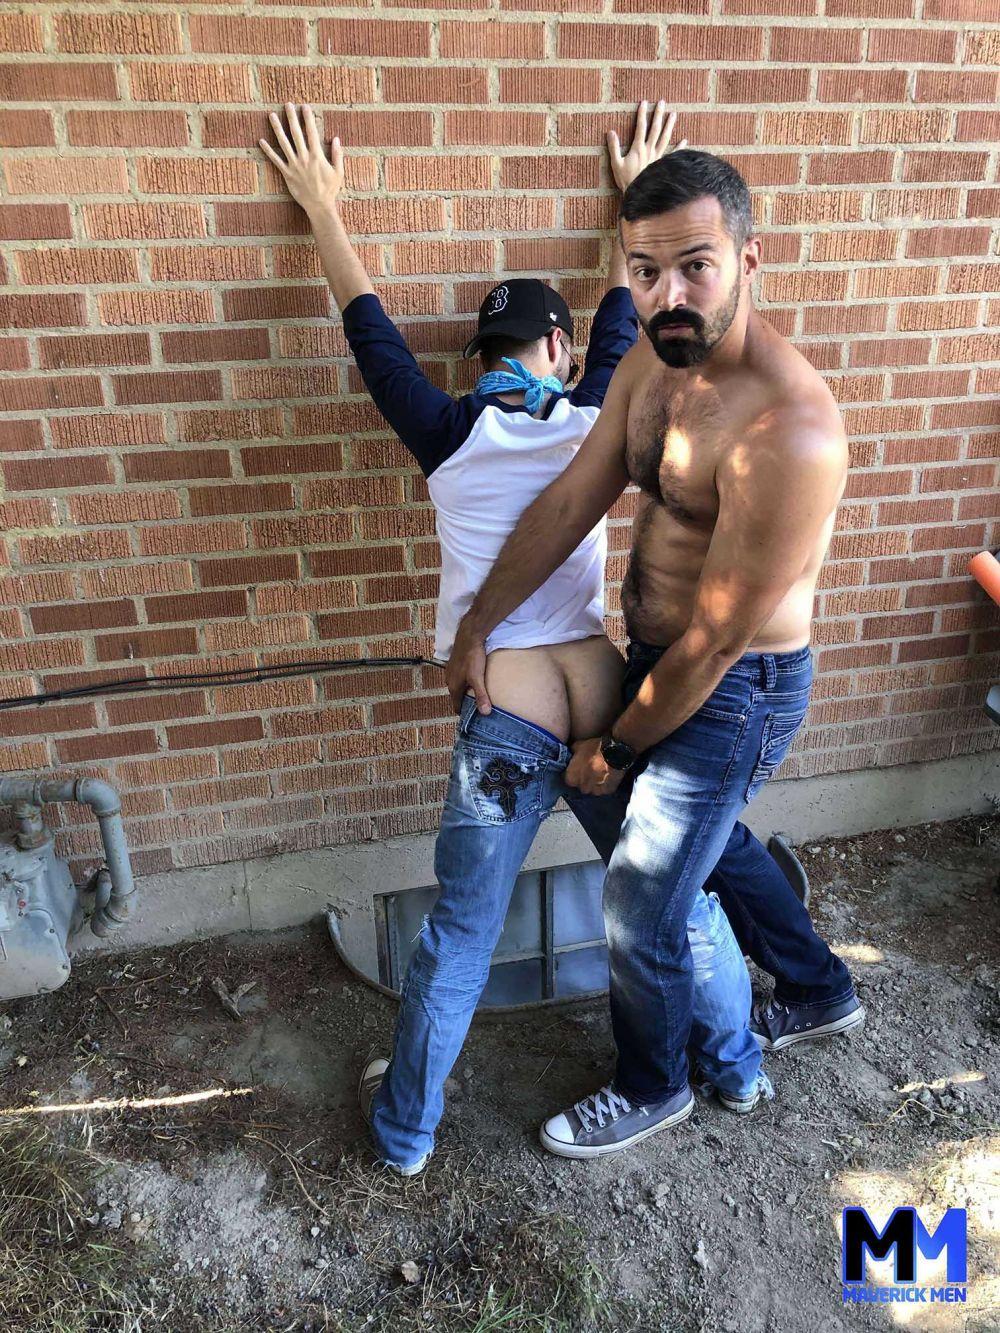 Maverick Men: Fuck Me In The Backyard 1